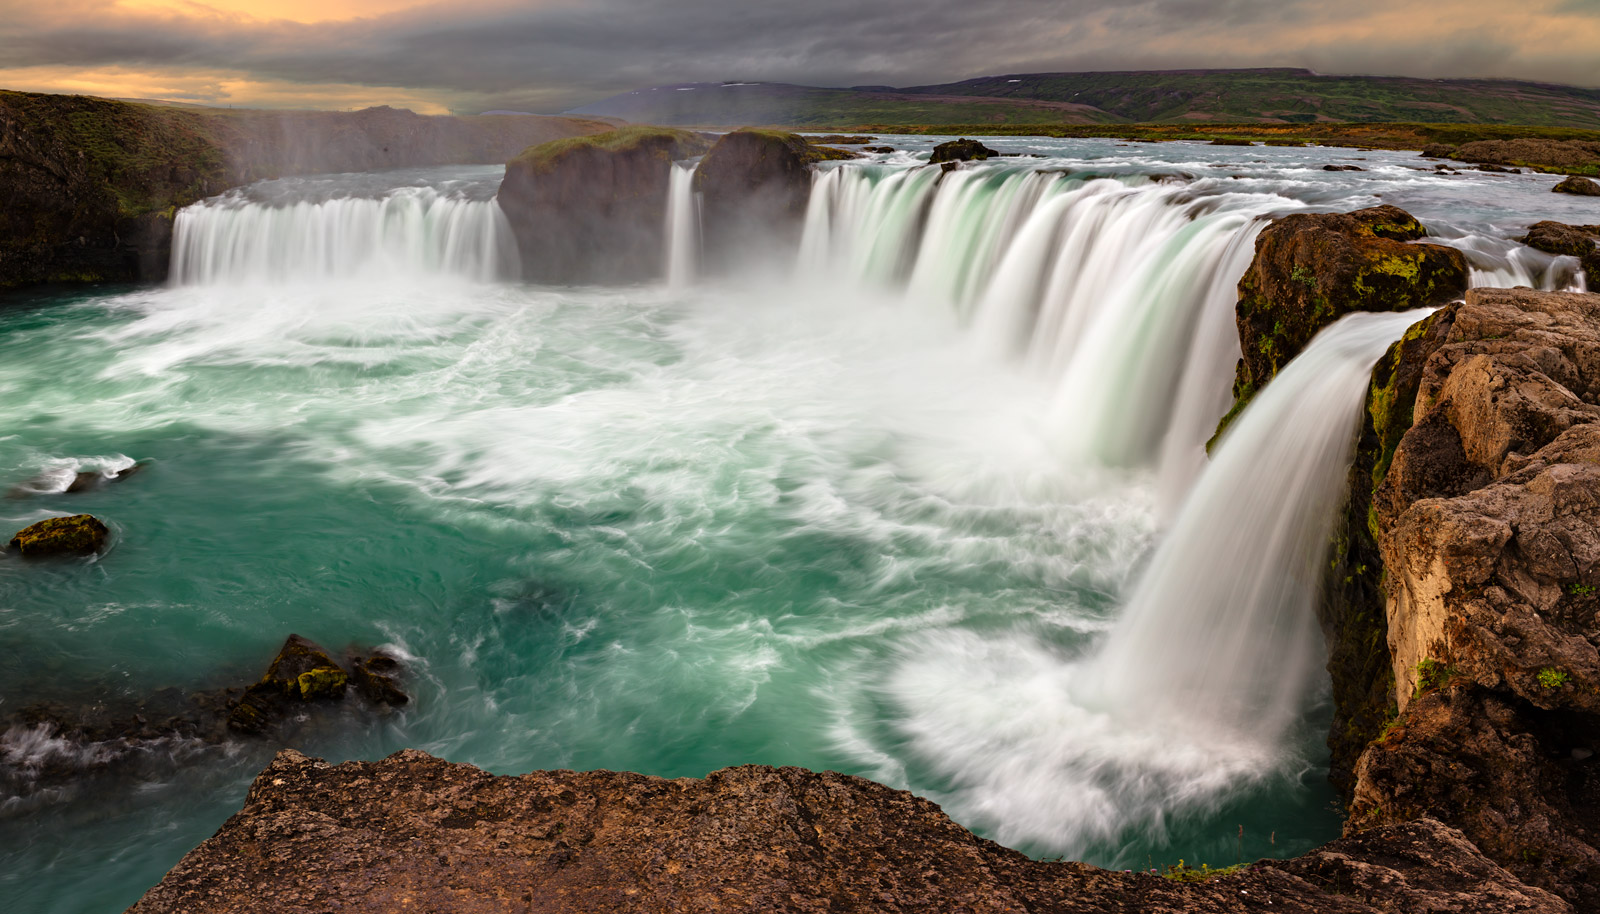 iceland, waterfall, godafoss, sunrise, limited edition, photograph, fine art, landscape, photo